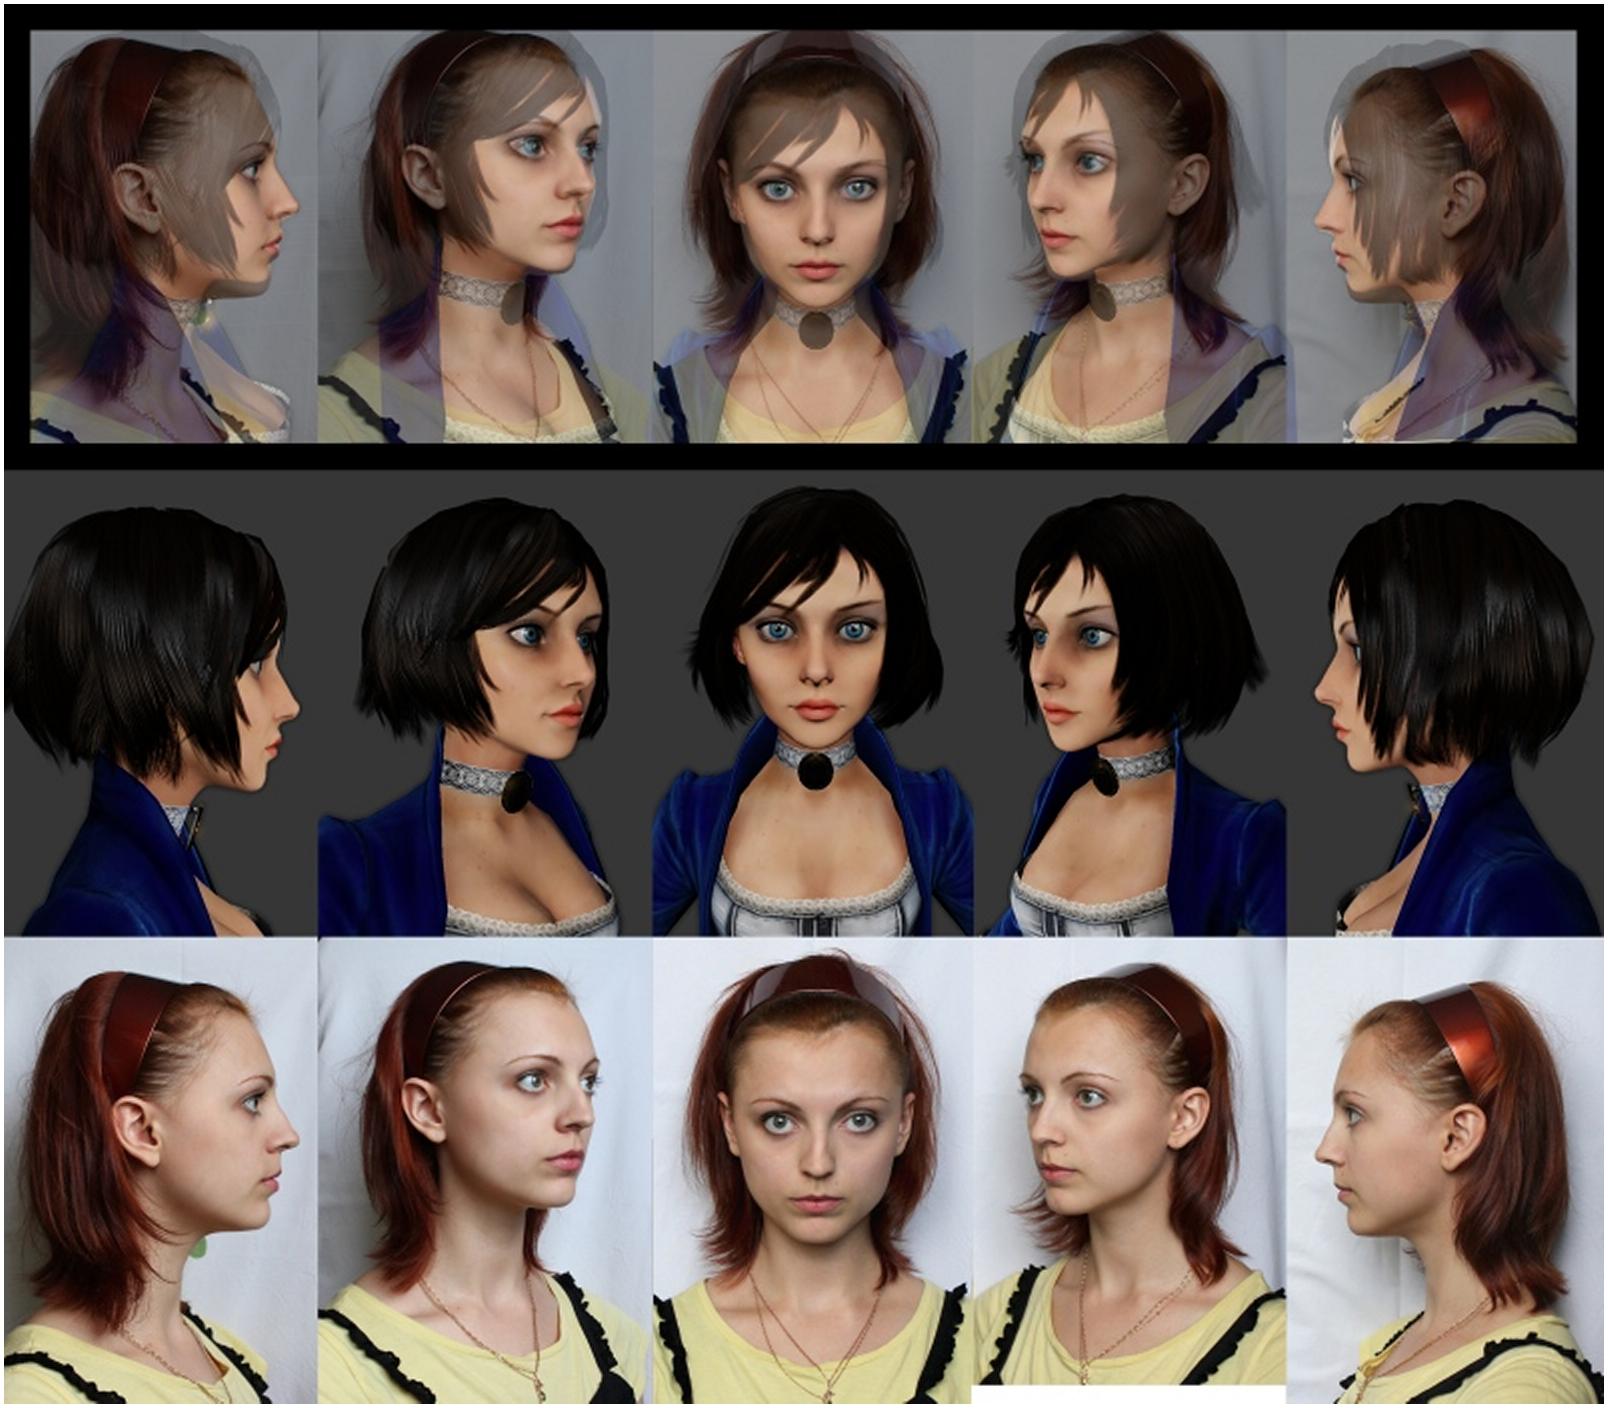 Anna Moleva as BioShock Infinite Elizabeth